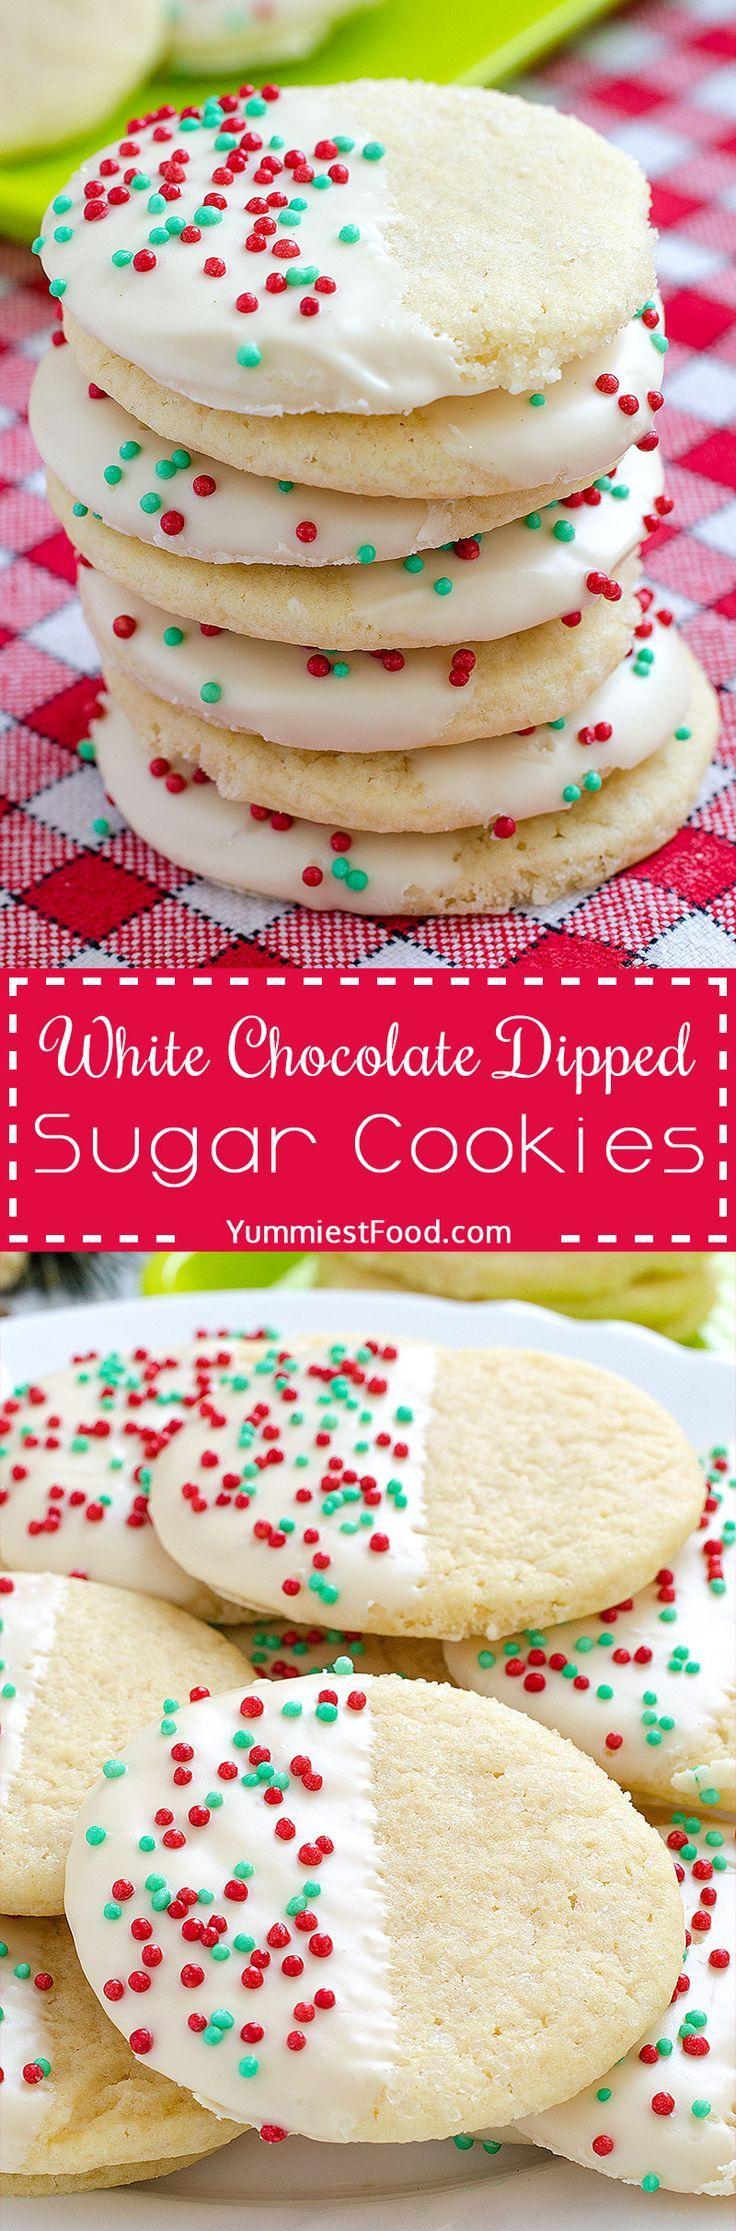 White Chocolate Dipped Sugar Cookies | Recipe | White chocolate ...